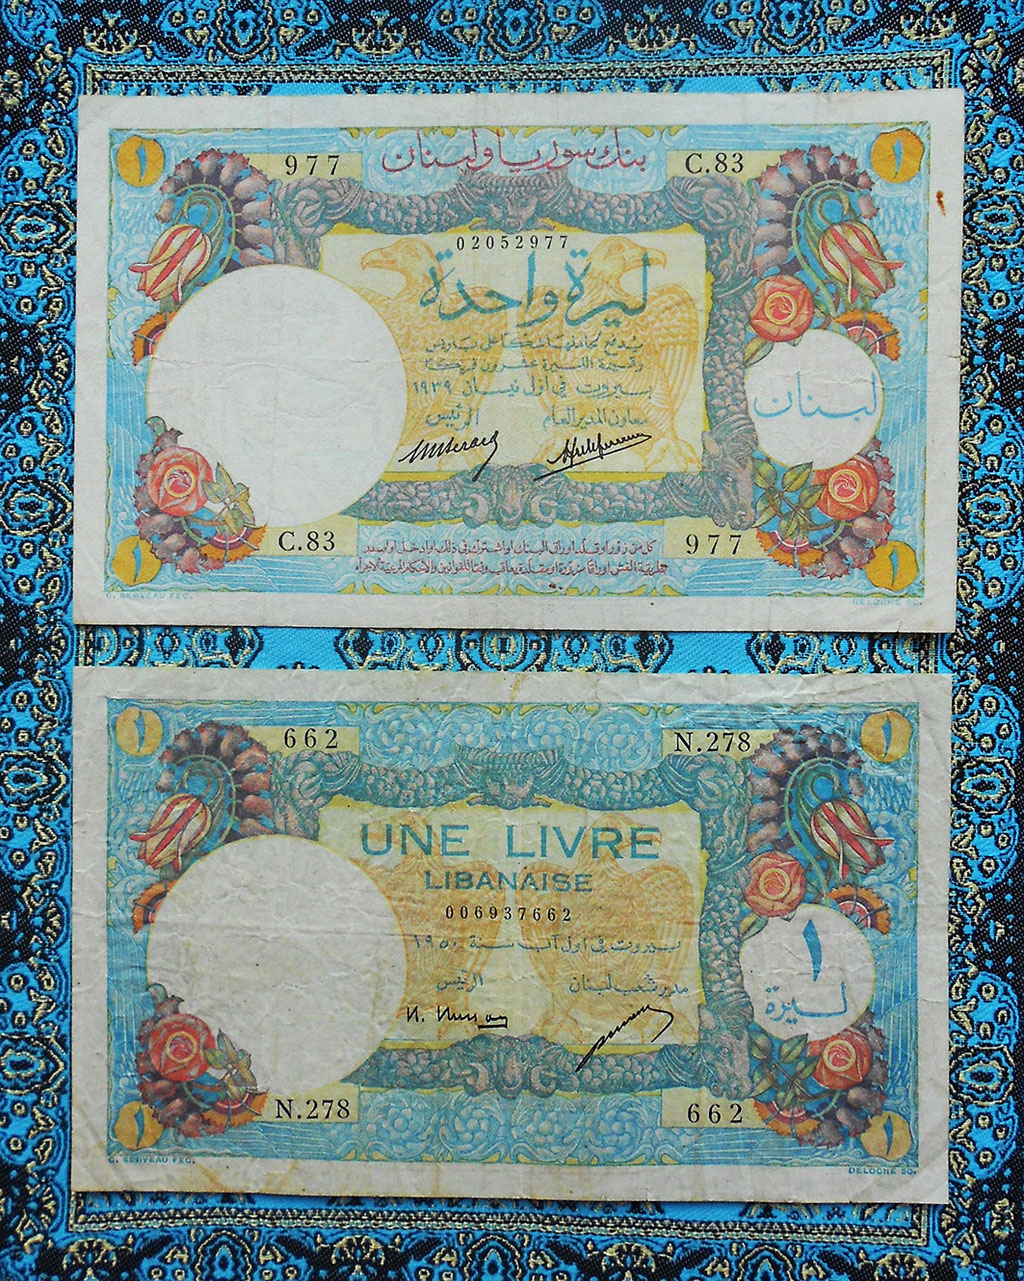 Libano 1 libra 1939 vs. 1 libra 1950 anversos